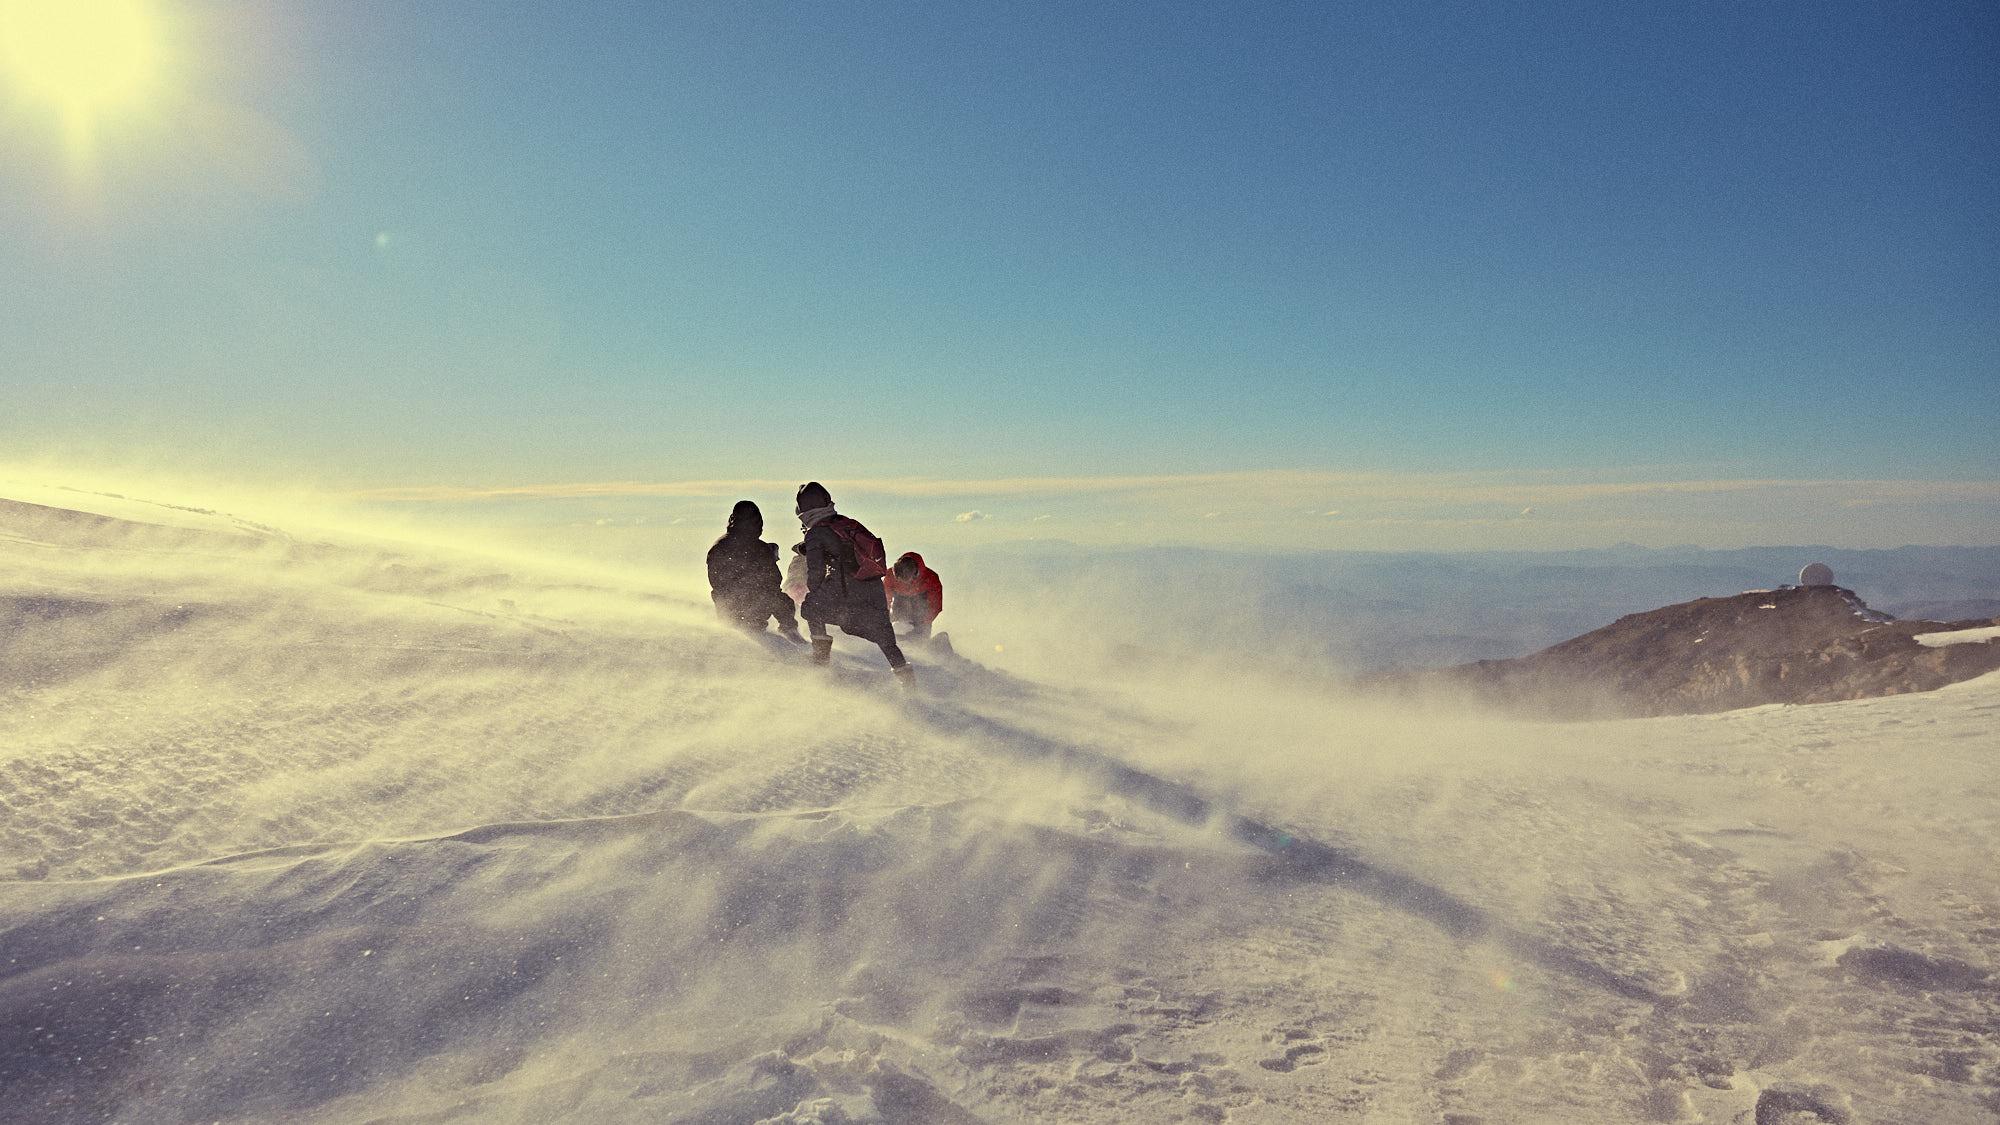 sierra nevada mountain production